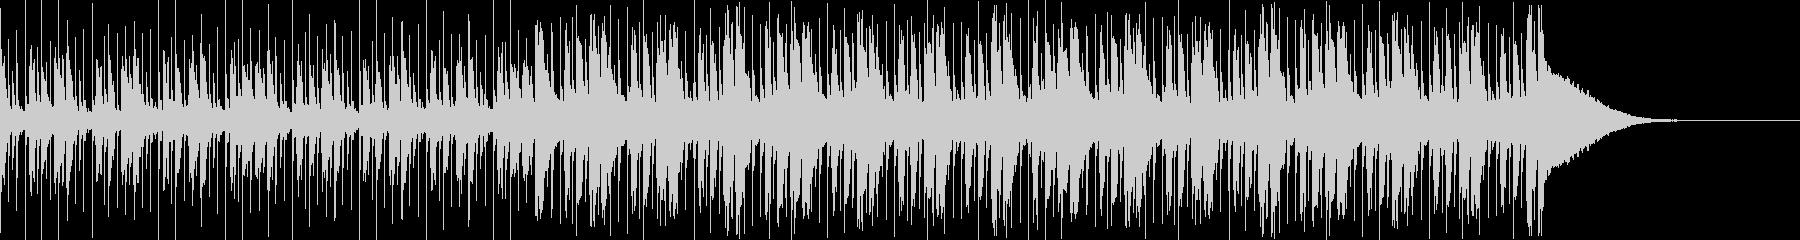 Pf「喰処」和風現代ジャズの未再生の波形